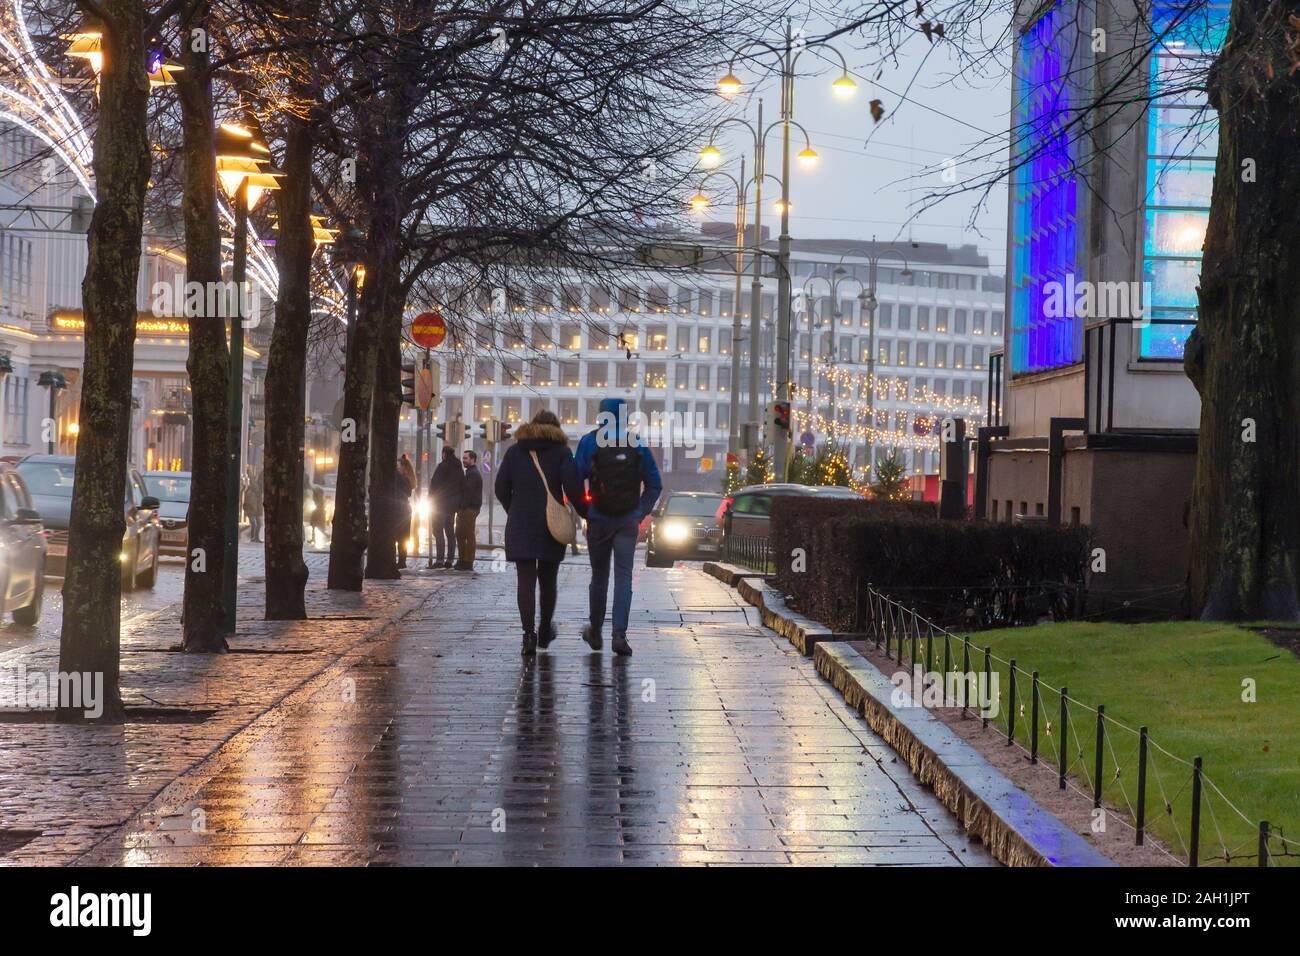 Pohjois-Esplanadi Street in the Evening in Helsinki Finland Stock Photo